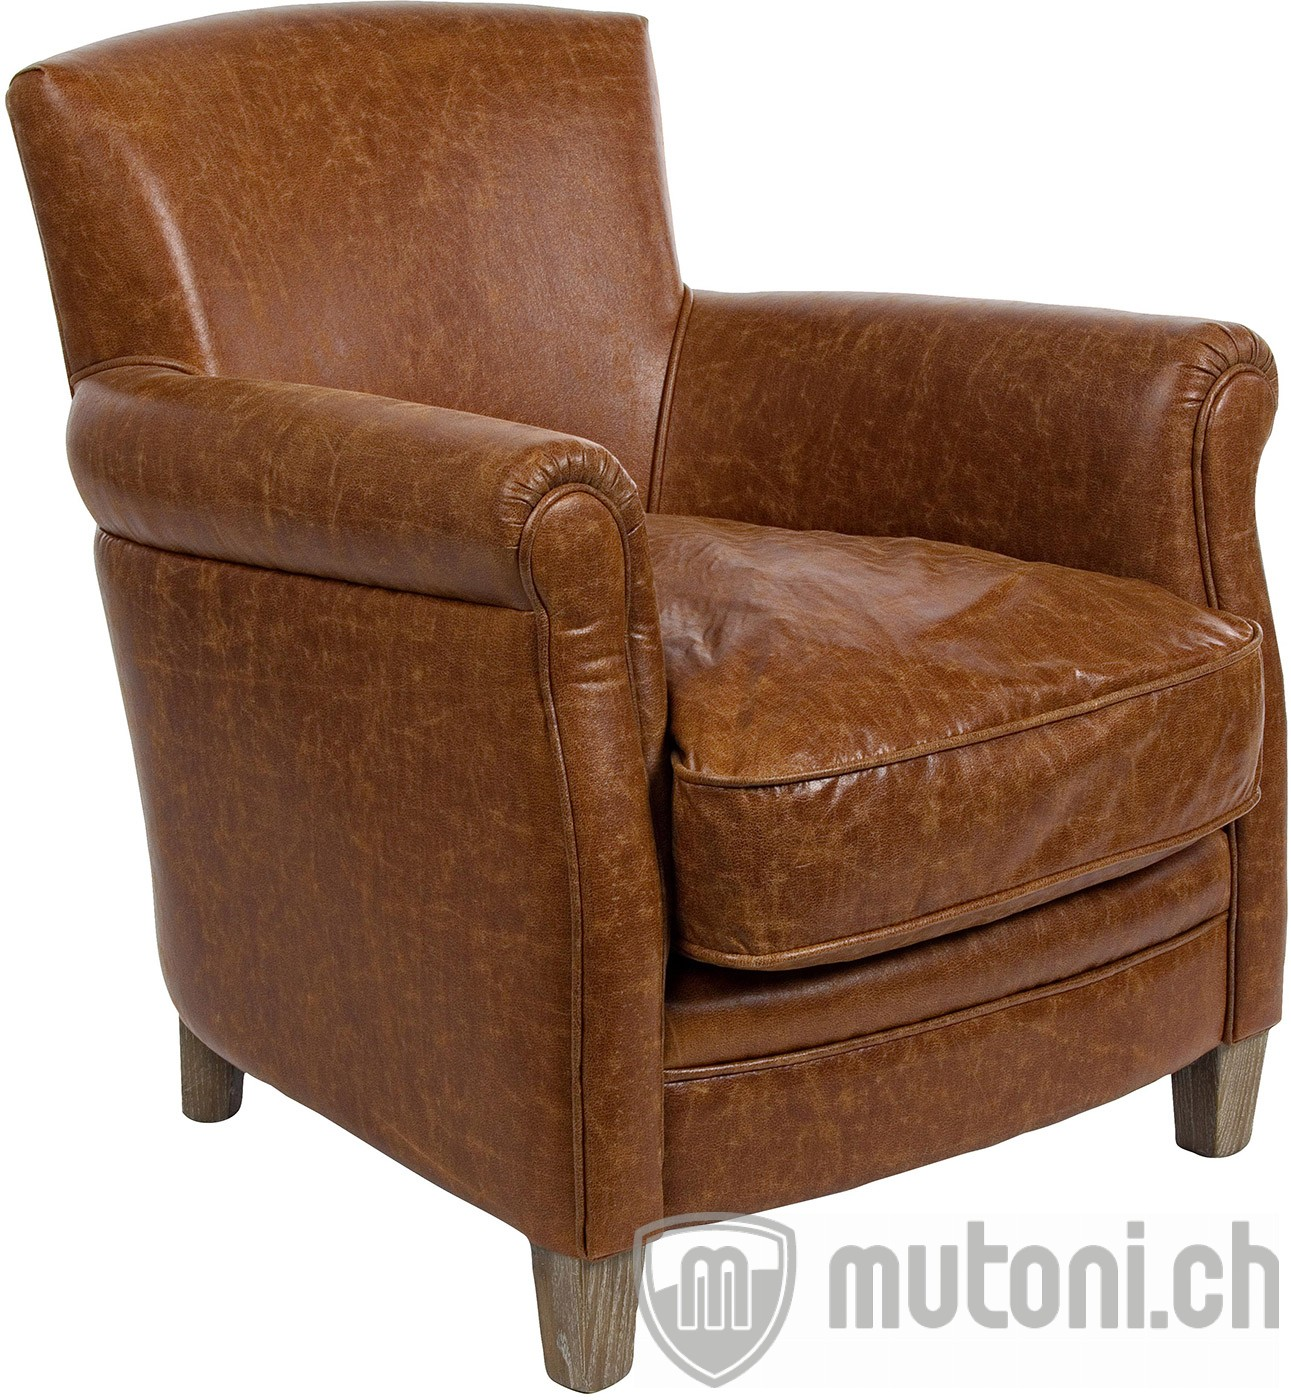 Sessel nebraska braun vintage mutoni lifestyle mutoni for Wohnzimmer sessel vintage